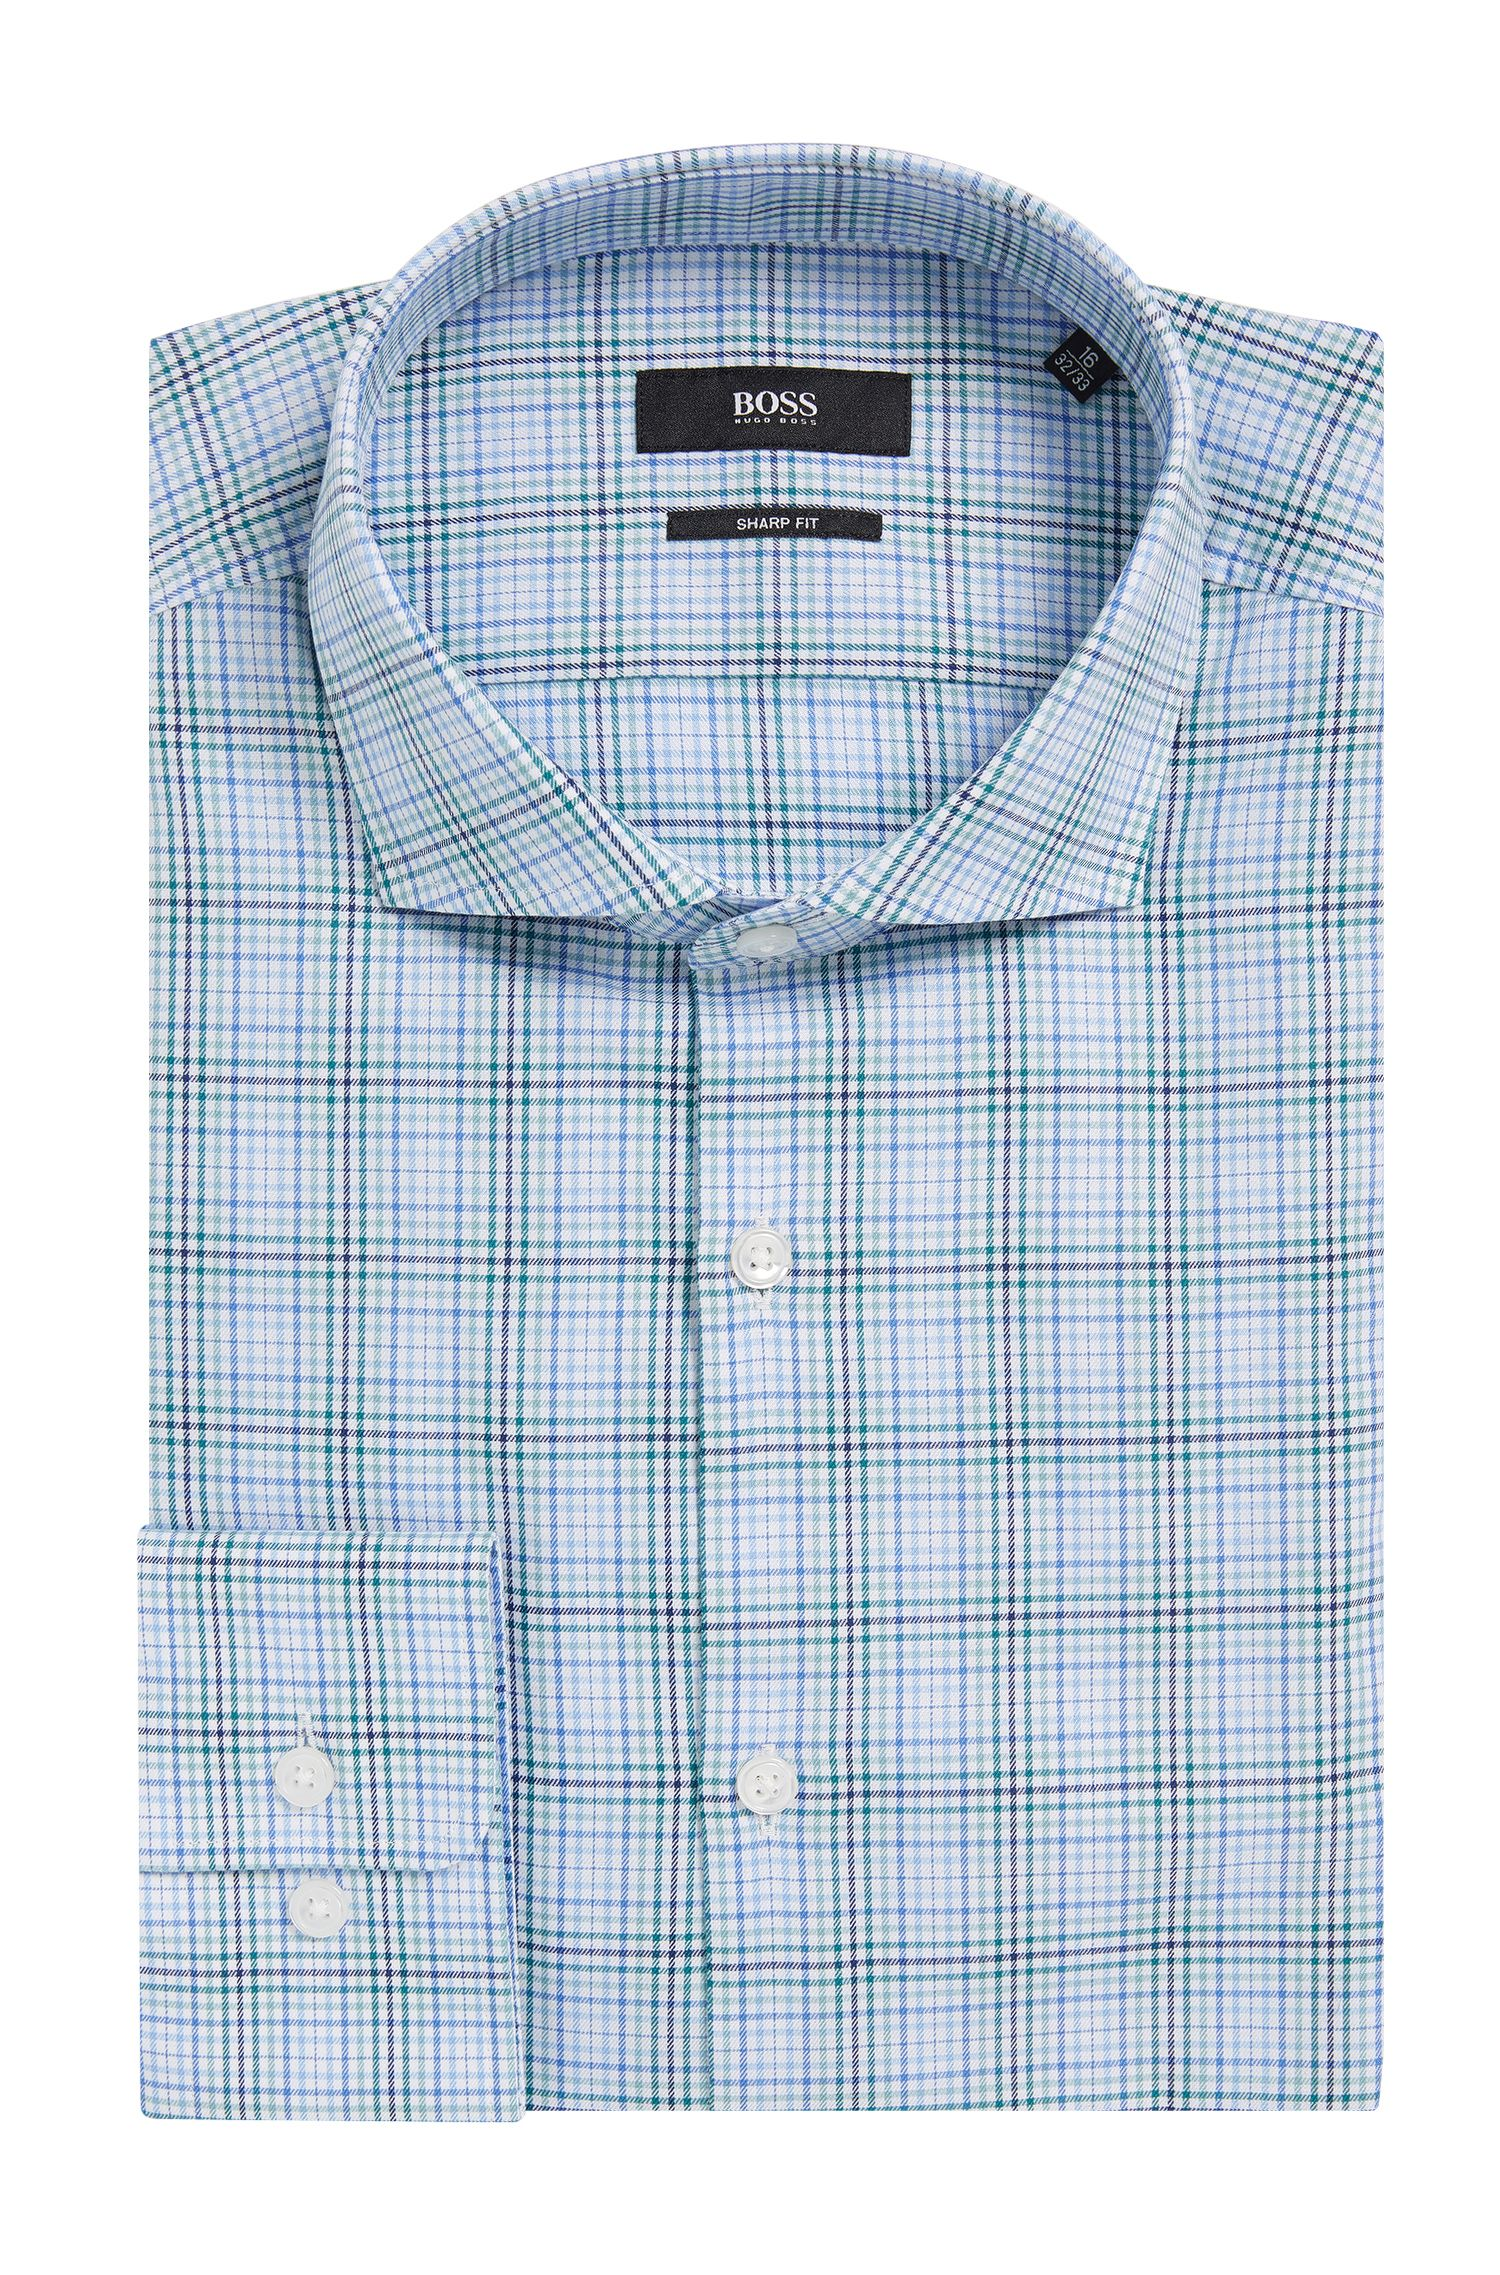 Plaid Cotton Dress Shirt, Sharp Fit   Mark US